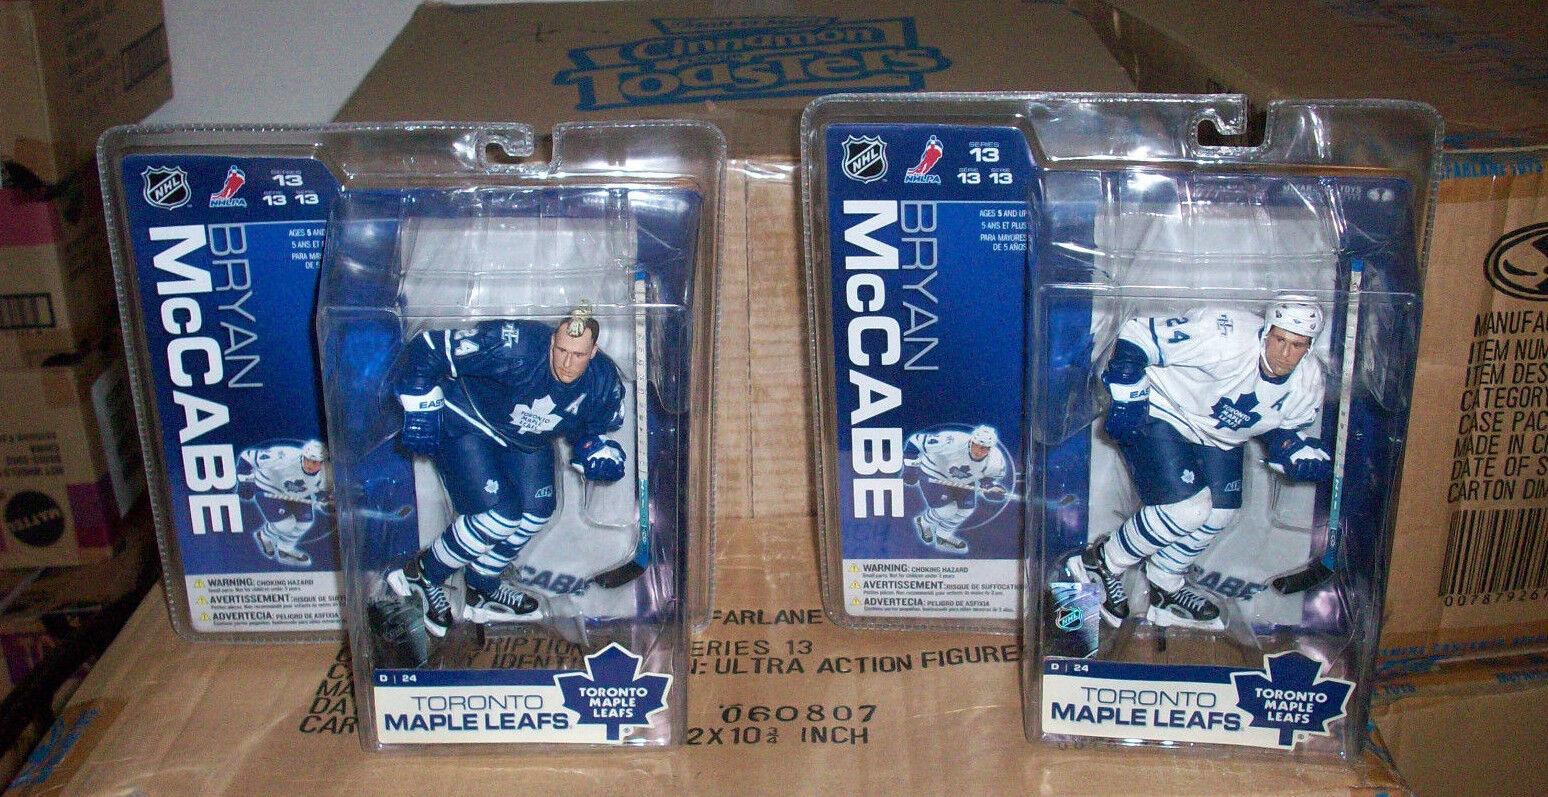 McFARLANE NHL 13 BRYAN McCABE MO HAWK VARIANT & REGULAR LOT HOCKEY ACTION FIGURE